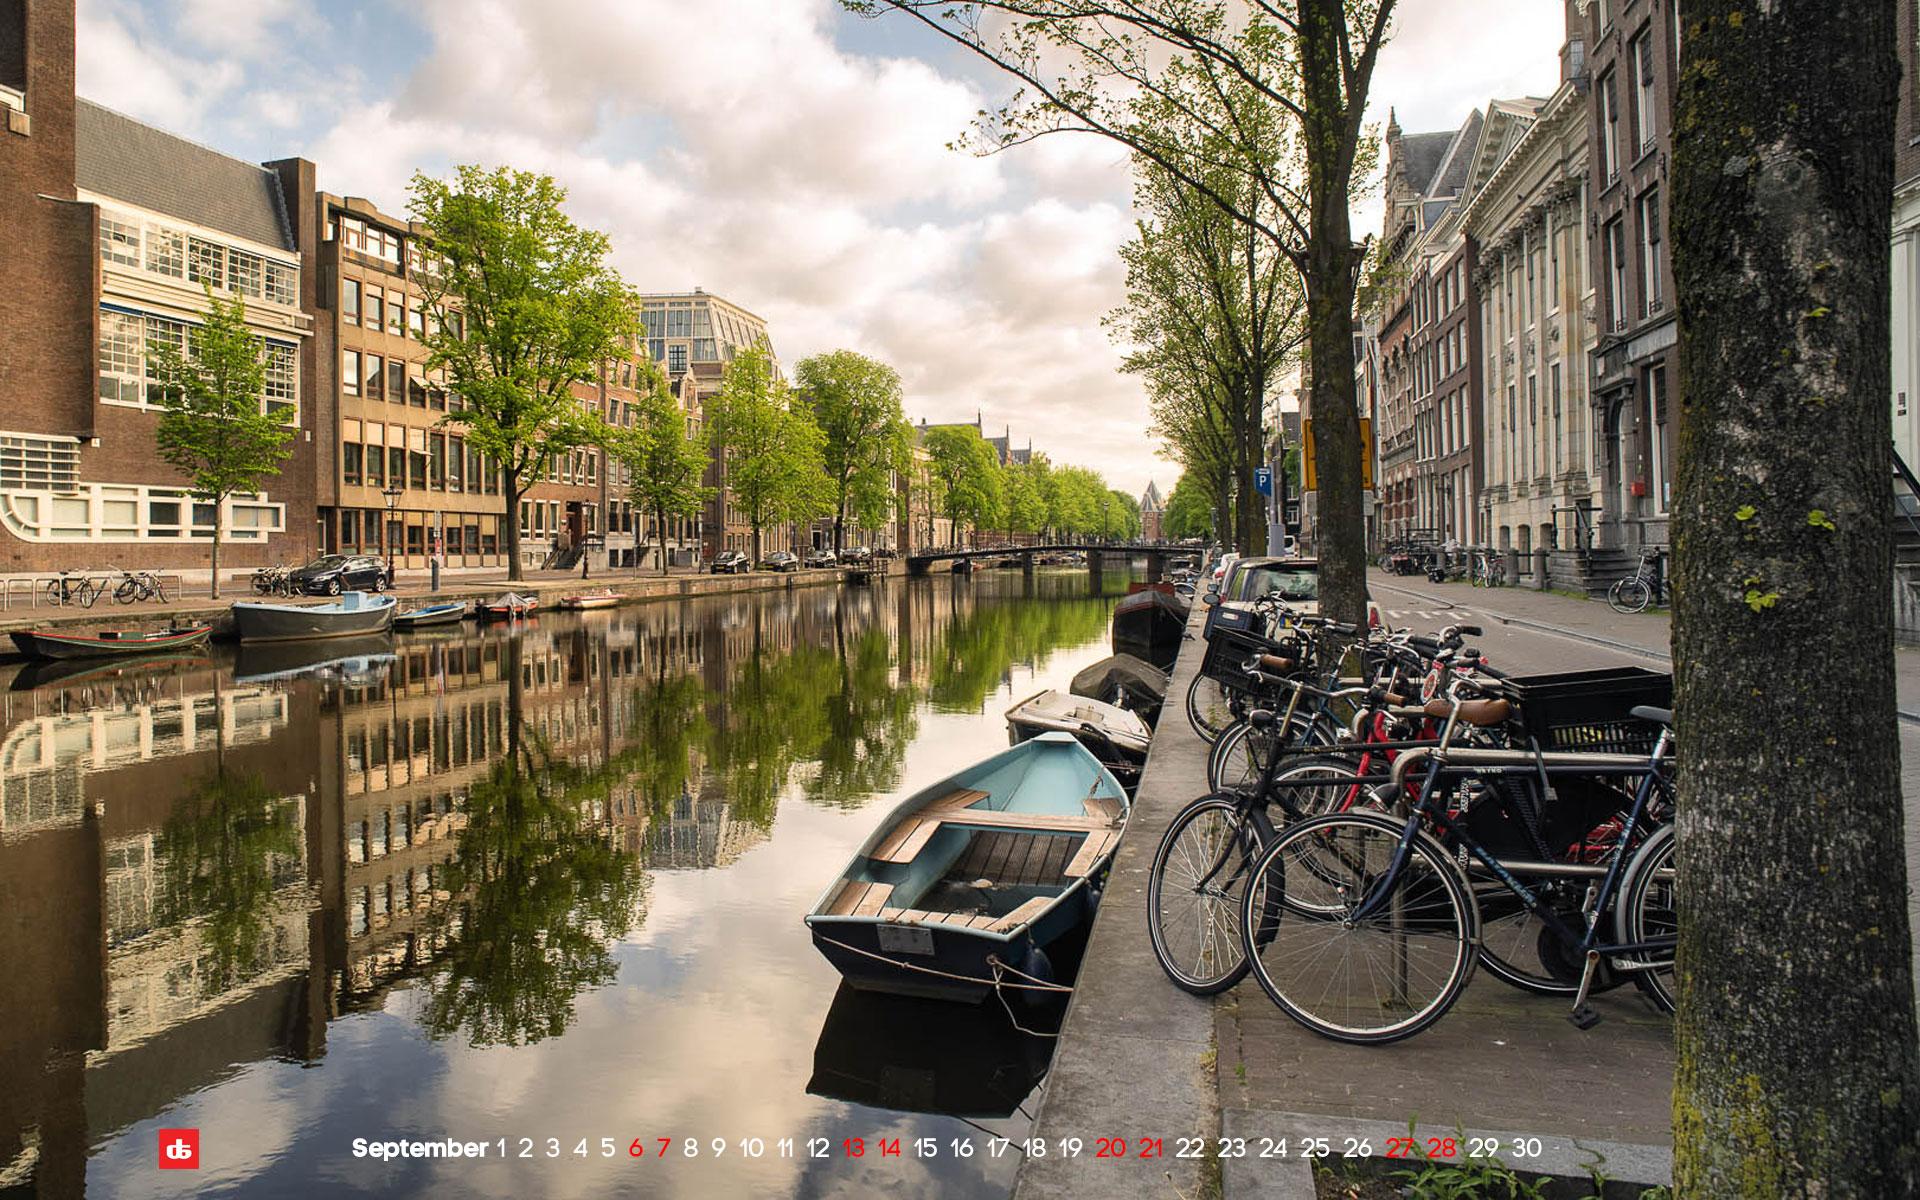 Kloveniersburgwal in Amsterdam